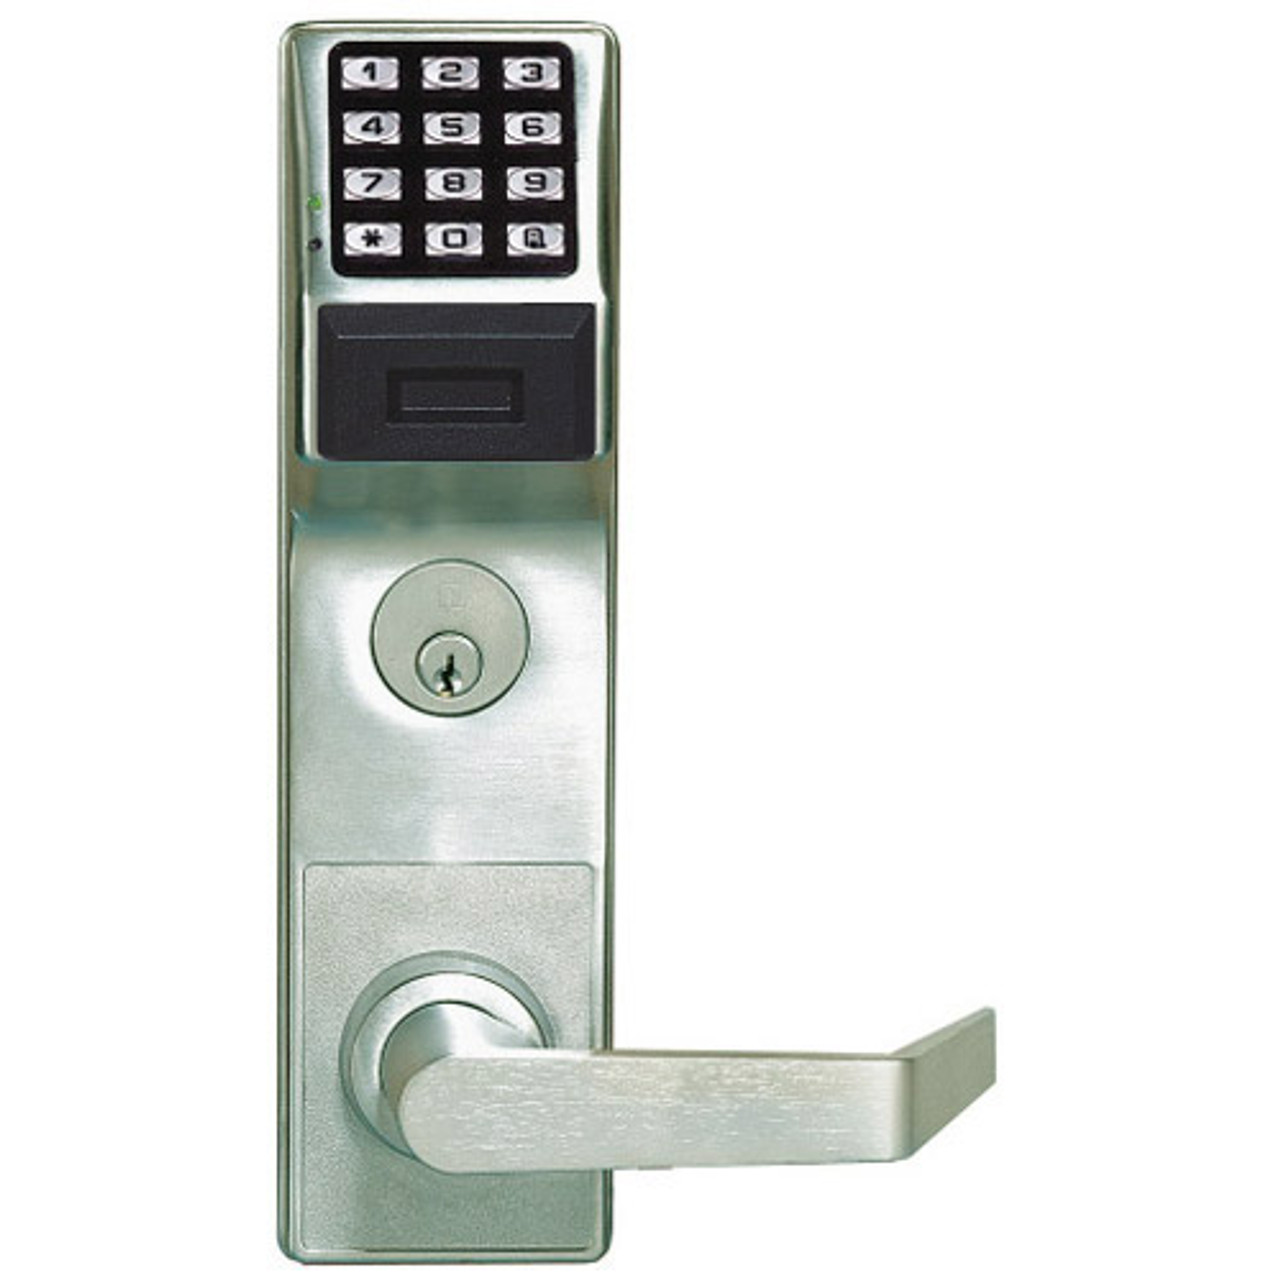 PDL6500CRR-26D Alarm Lock Trilogy Networx Electronic Digital Lock in Satin Chrome Finish